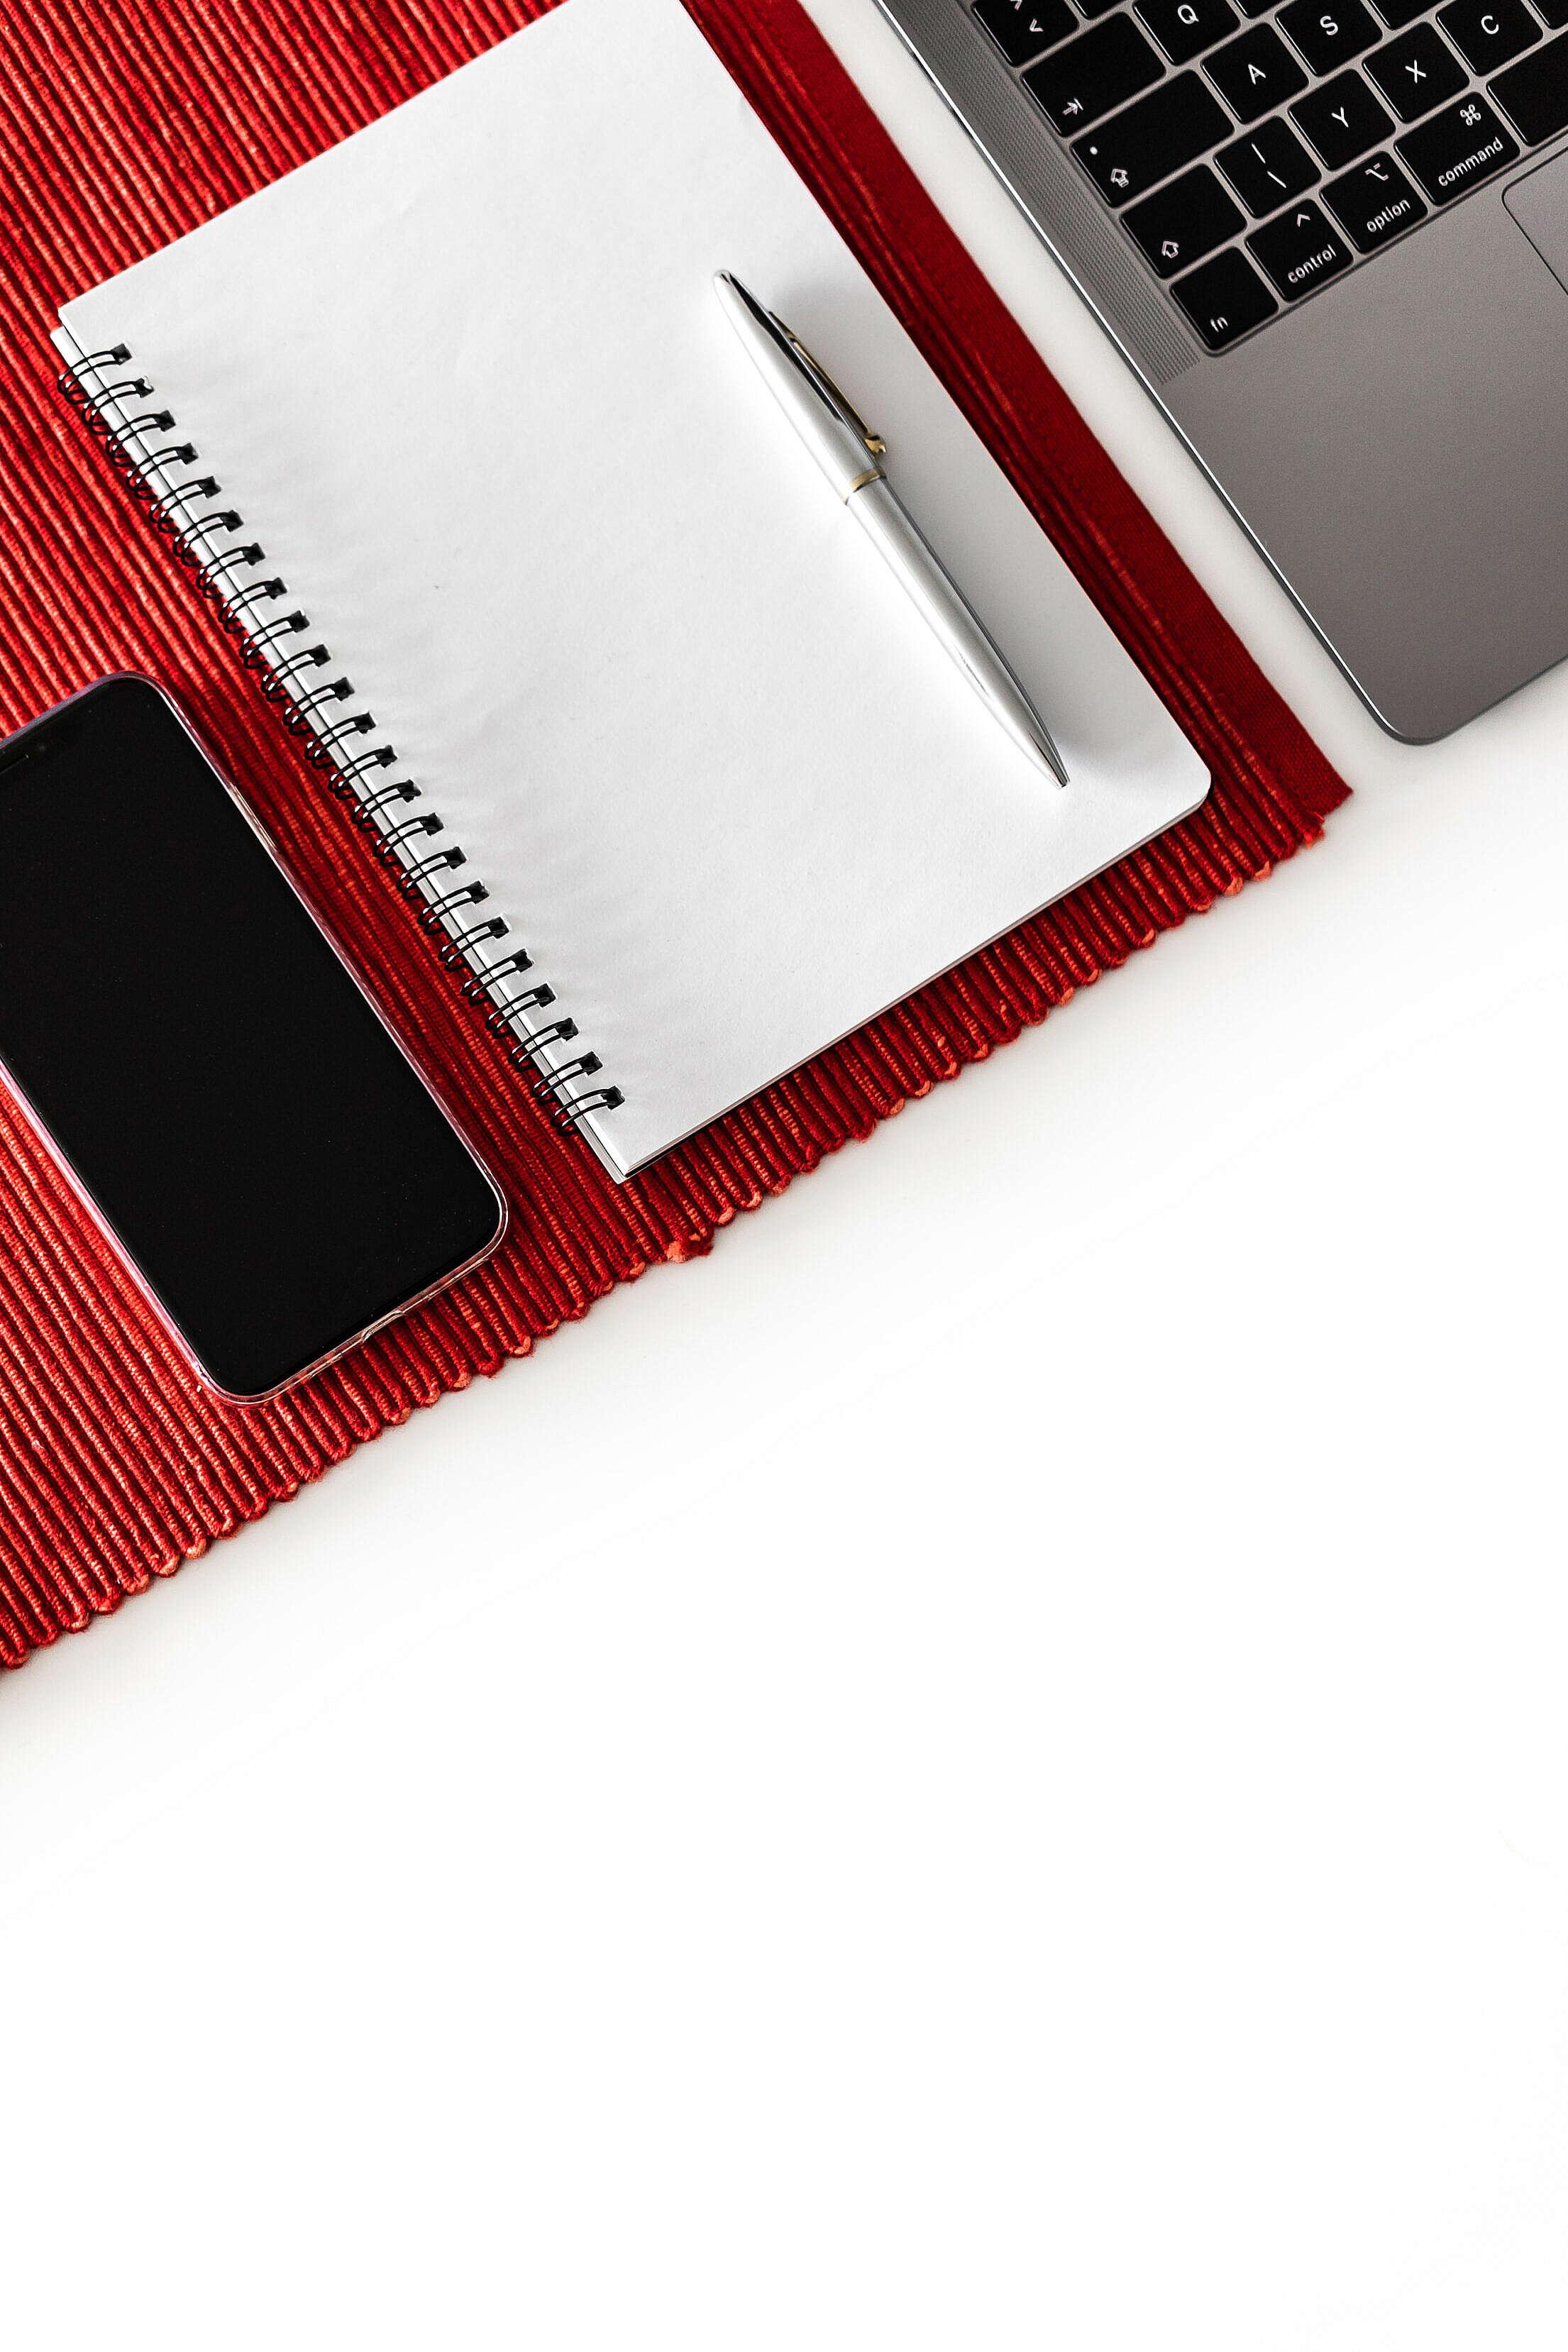 Blank Notebook Mockup on White Desk Free Stock Photo